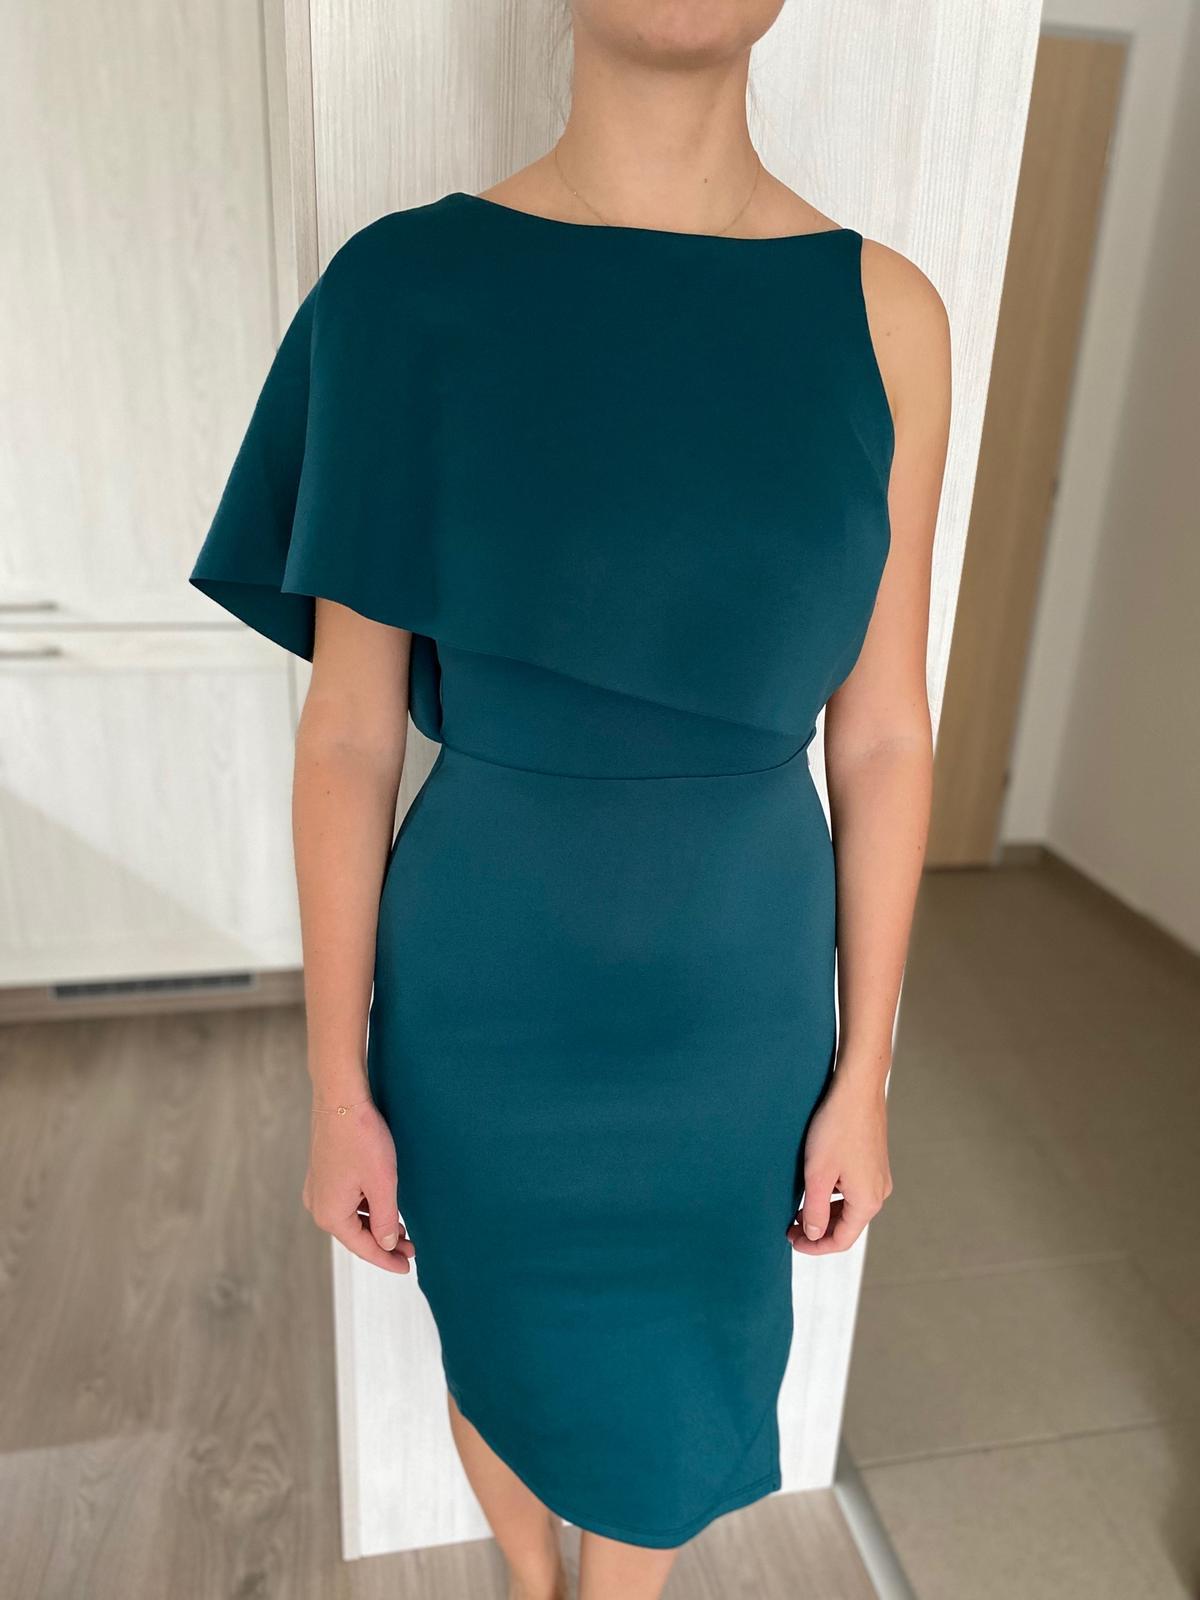 Dámske šaty - s visačkou - Obrázok č. 1